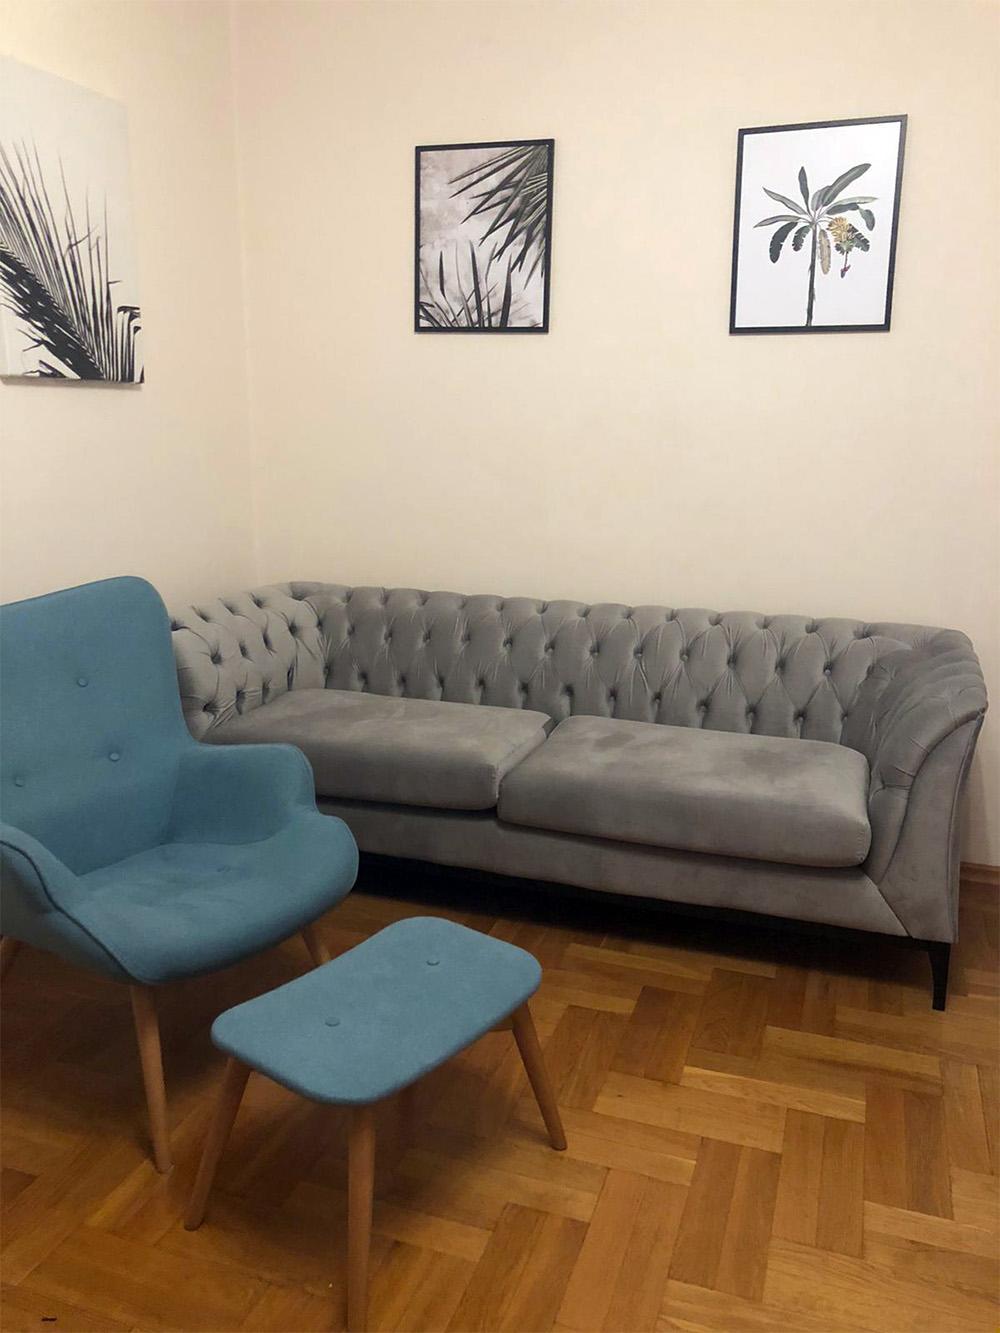 Chesterfield Modern Wood double sofa and Ducon eiderdown armchair